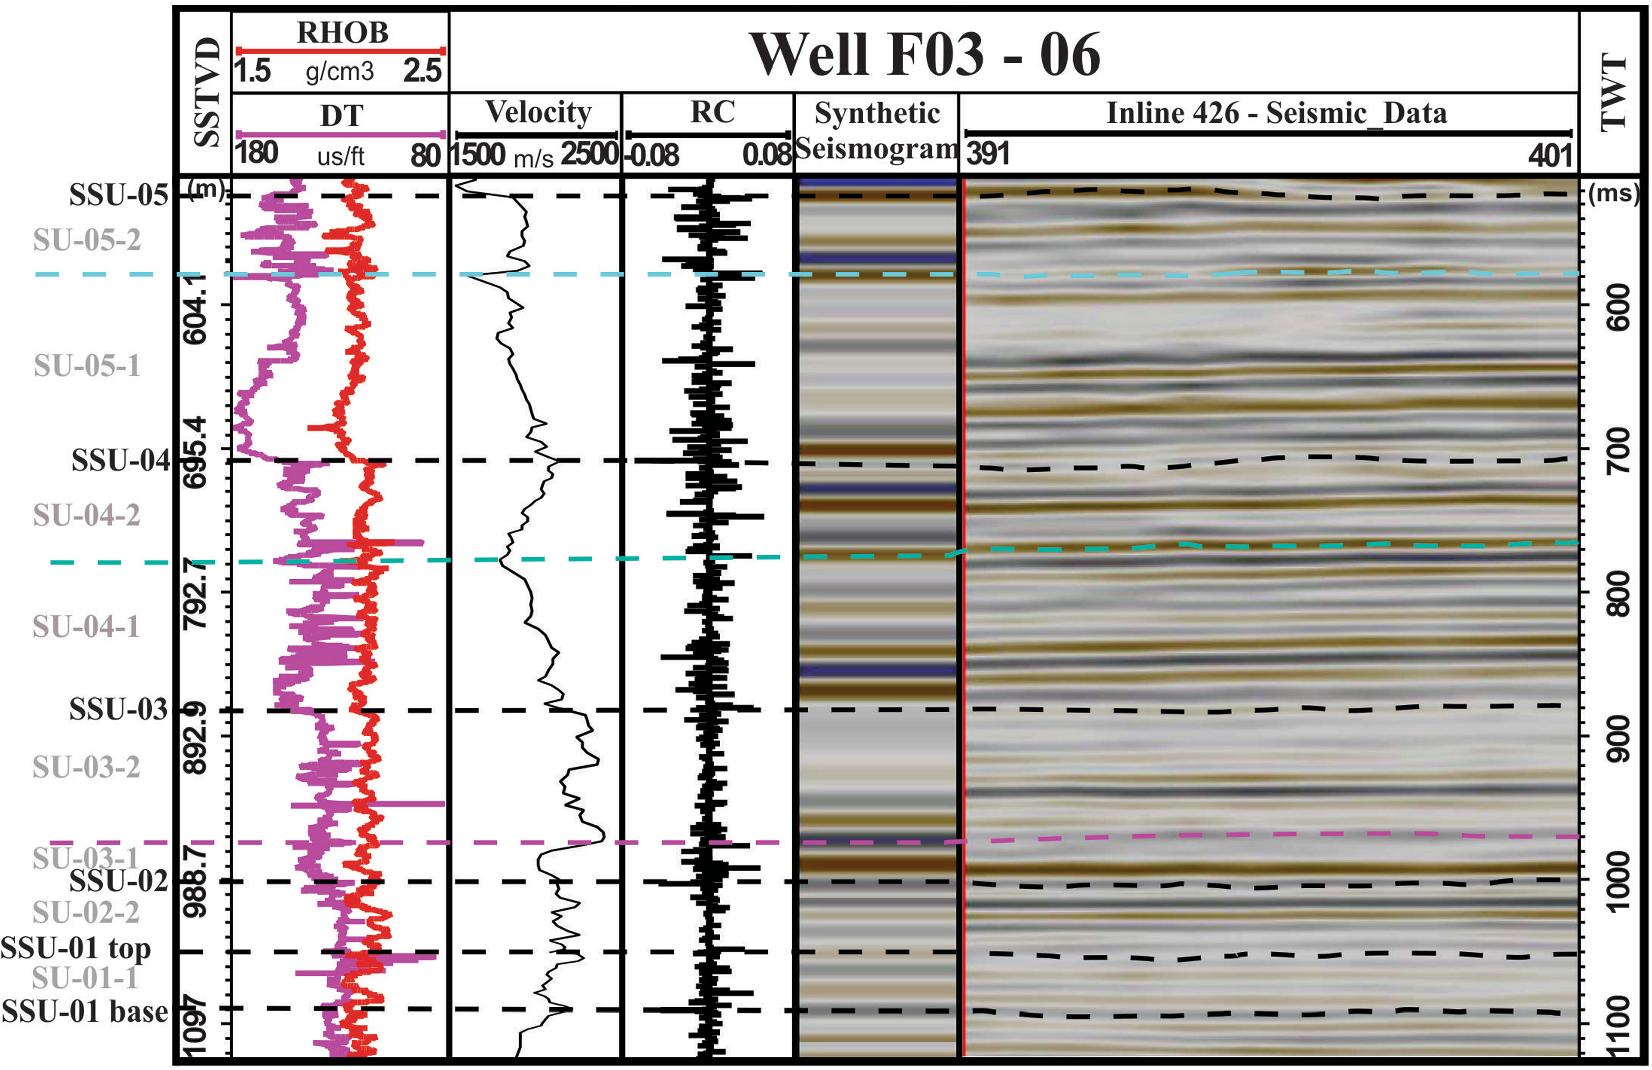 Plio-Pleistocene stratigraphic sequences and depositional